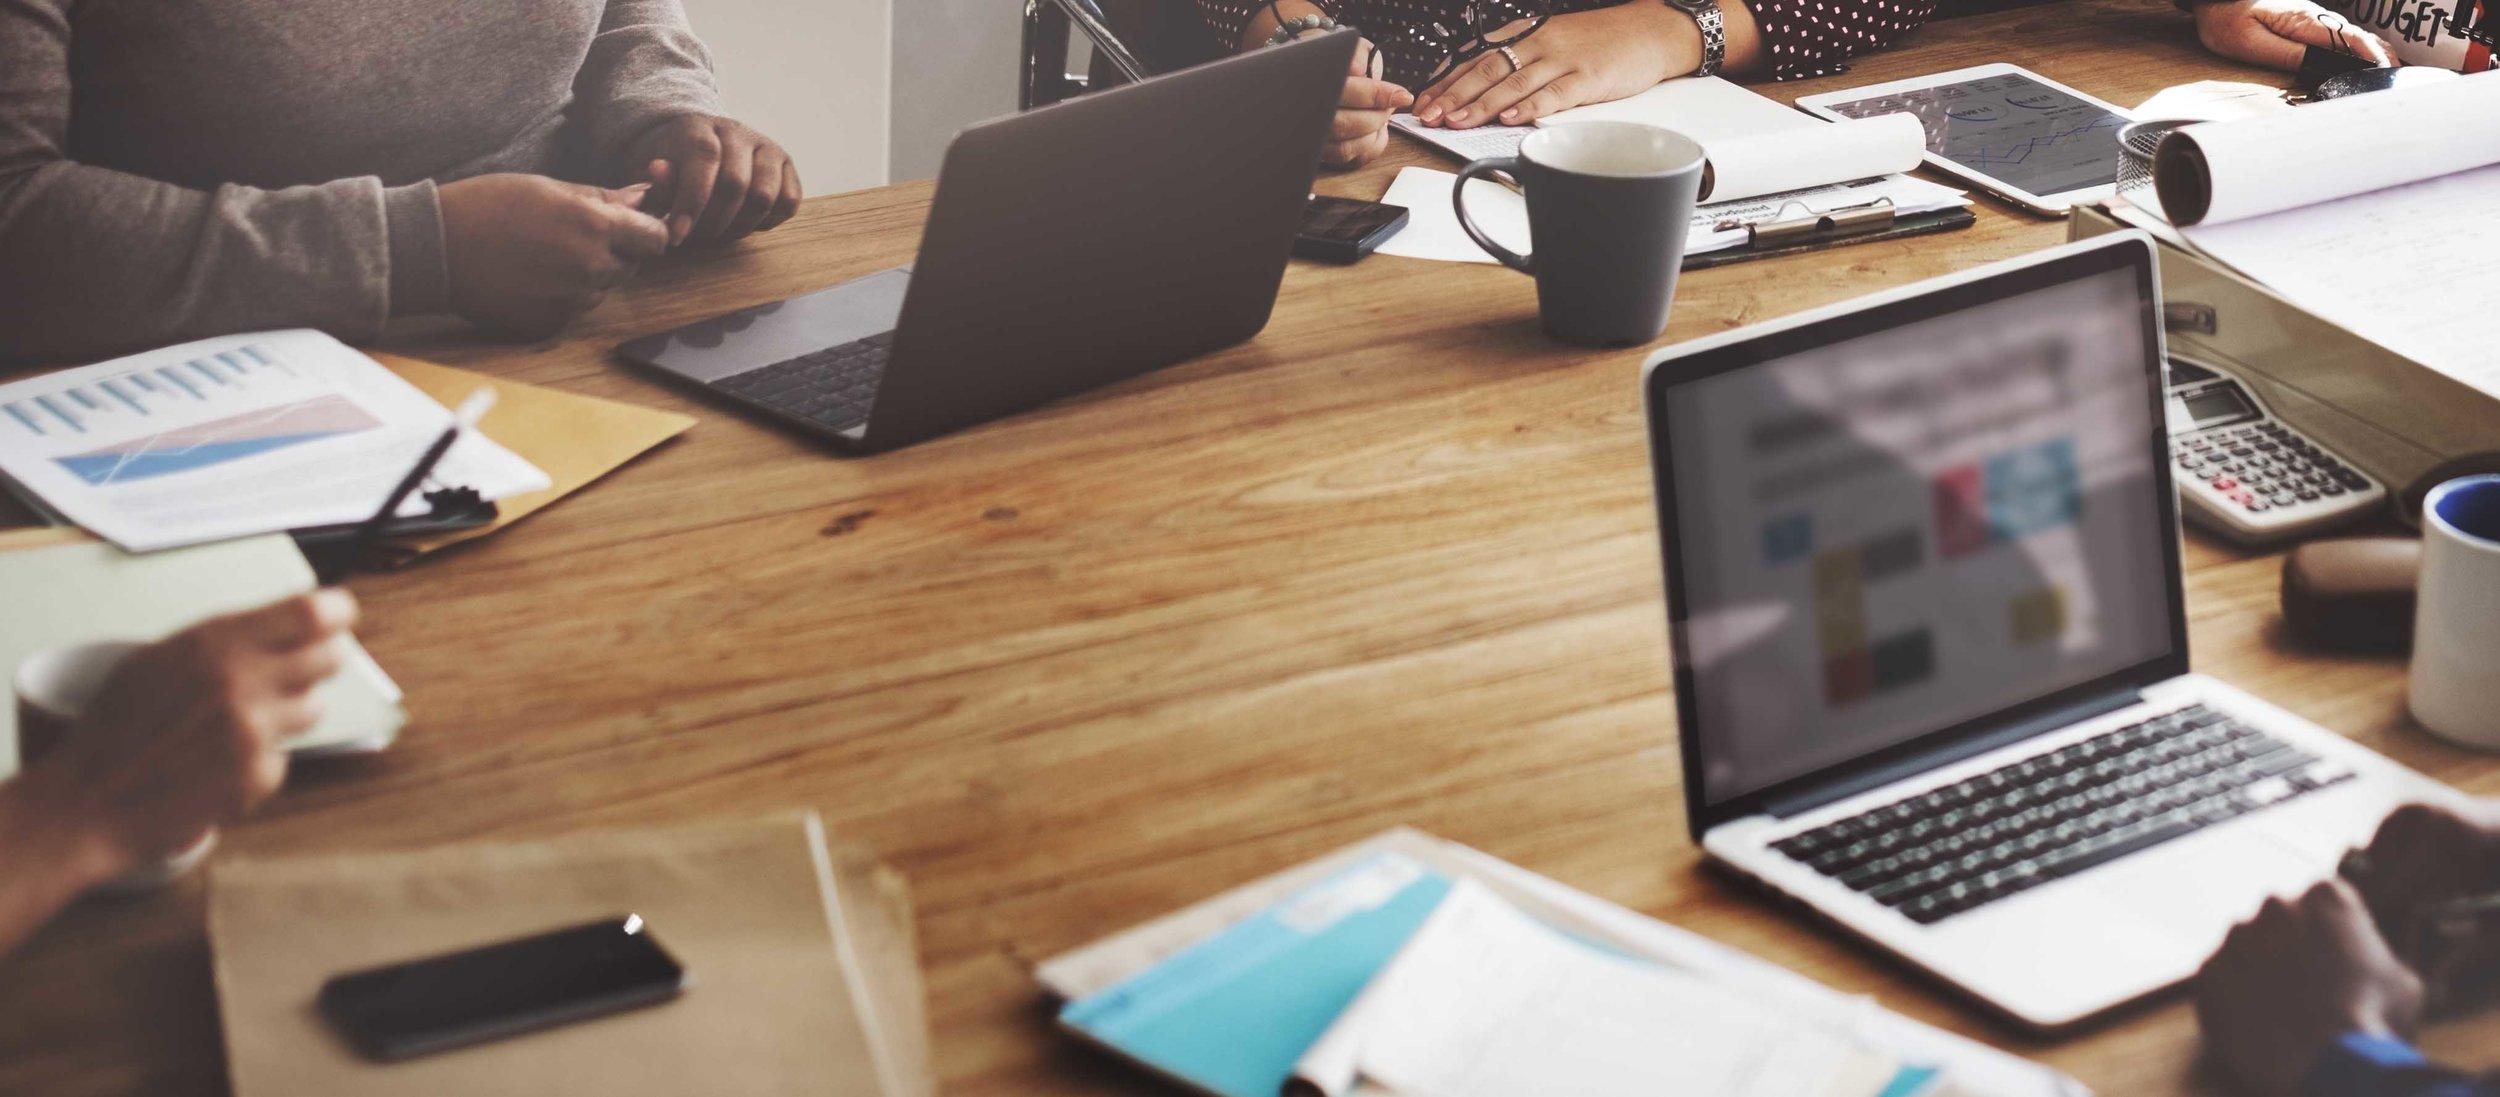 bigstock-Marketing-Team-Meeting-Brainst-121686059 copy.jpg